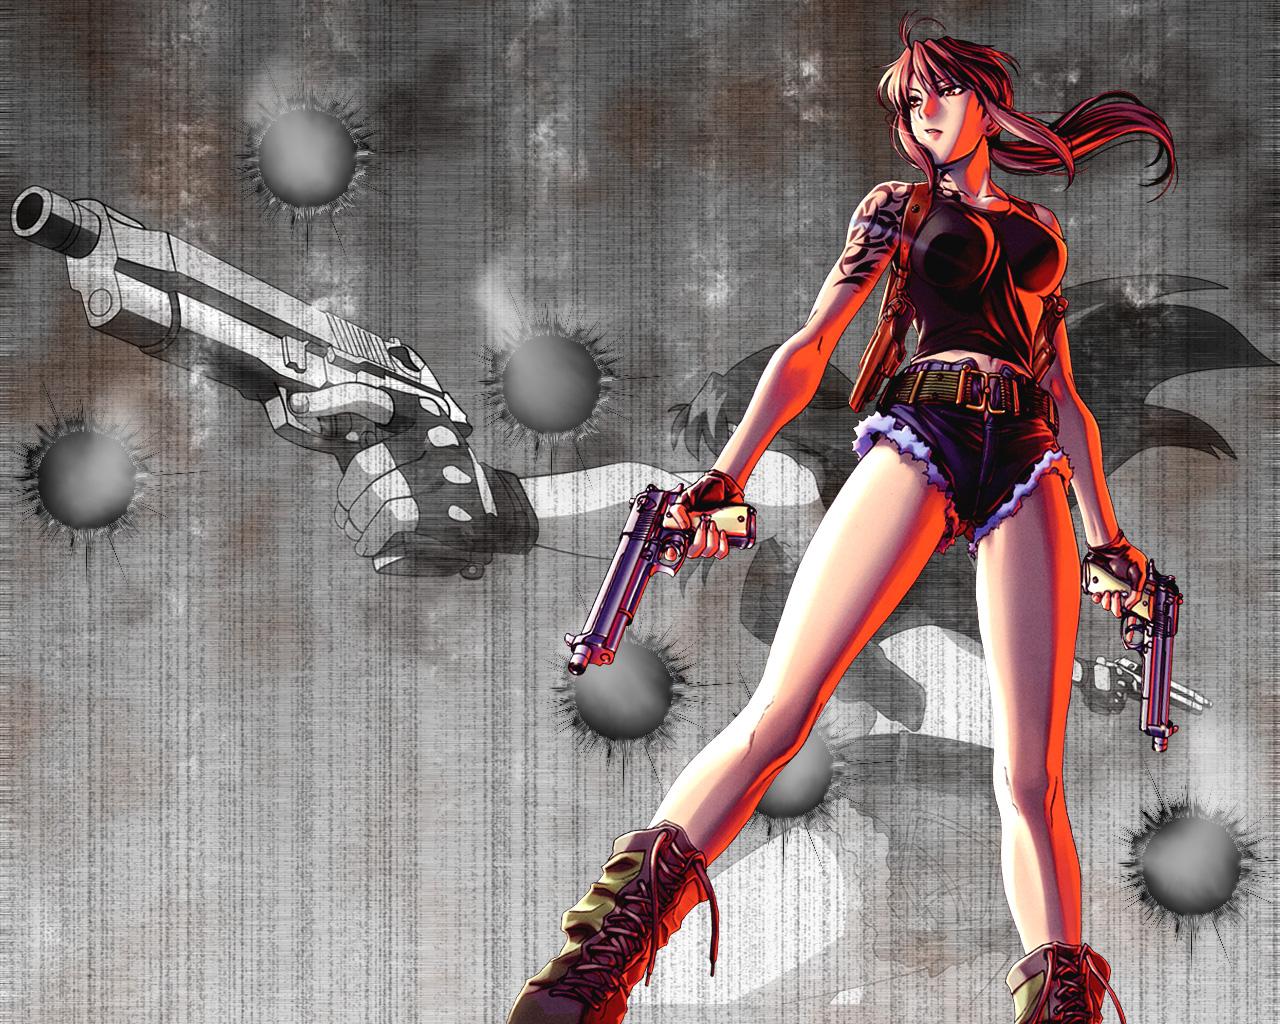 black_lagoon gun revy weapon